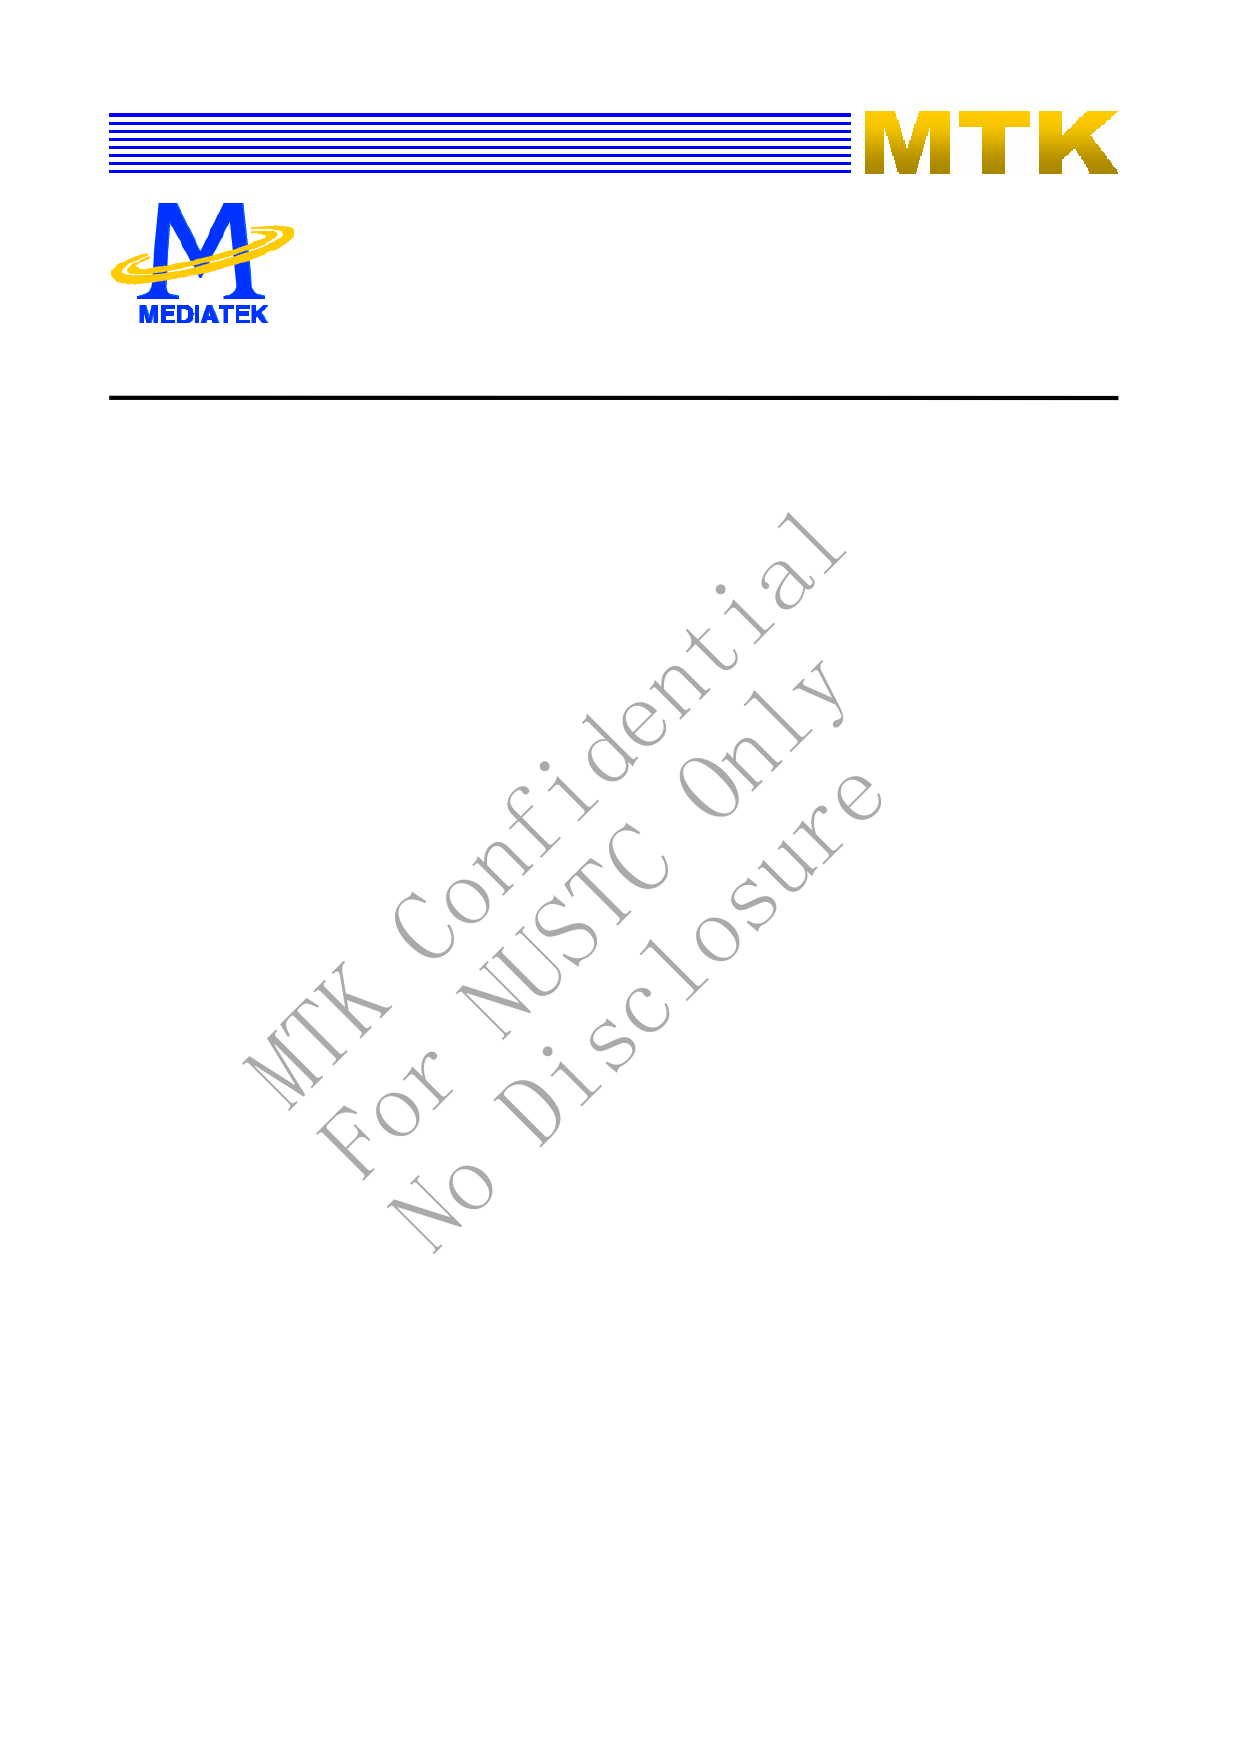 MT8292 데이터시트 및 MT8292 PDF